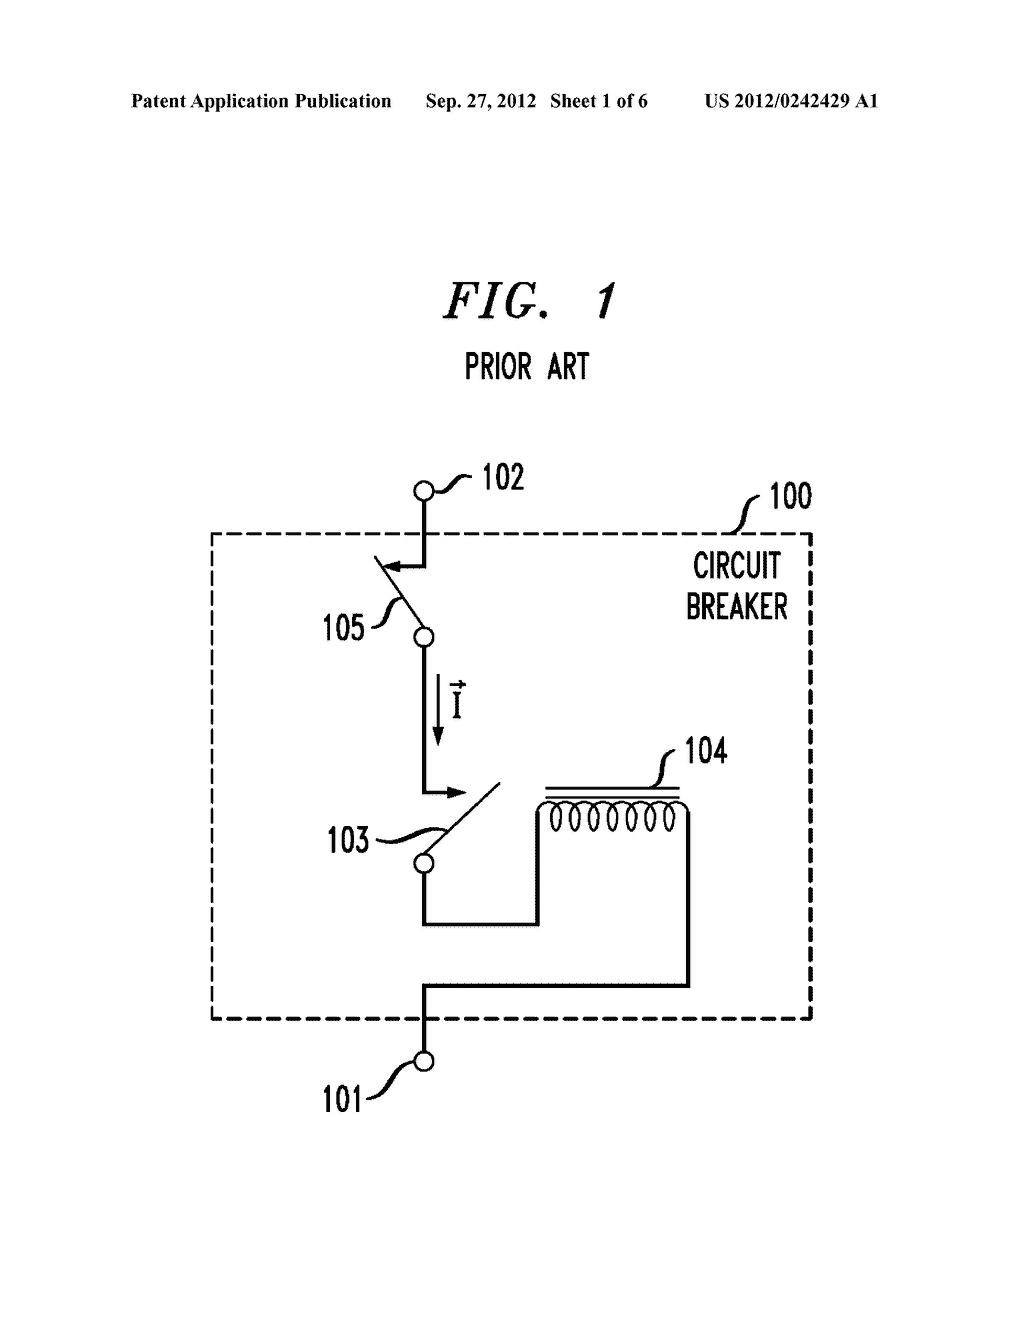 hight resolution of  circuit breaker diagram schematic and image 02 breaker circuit diagram